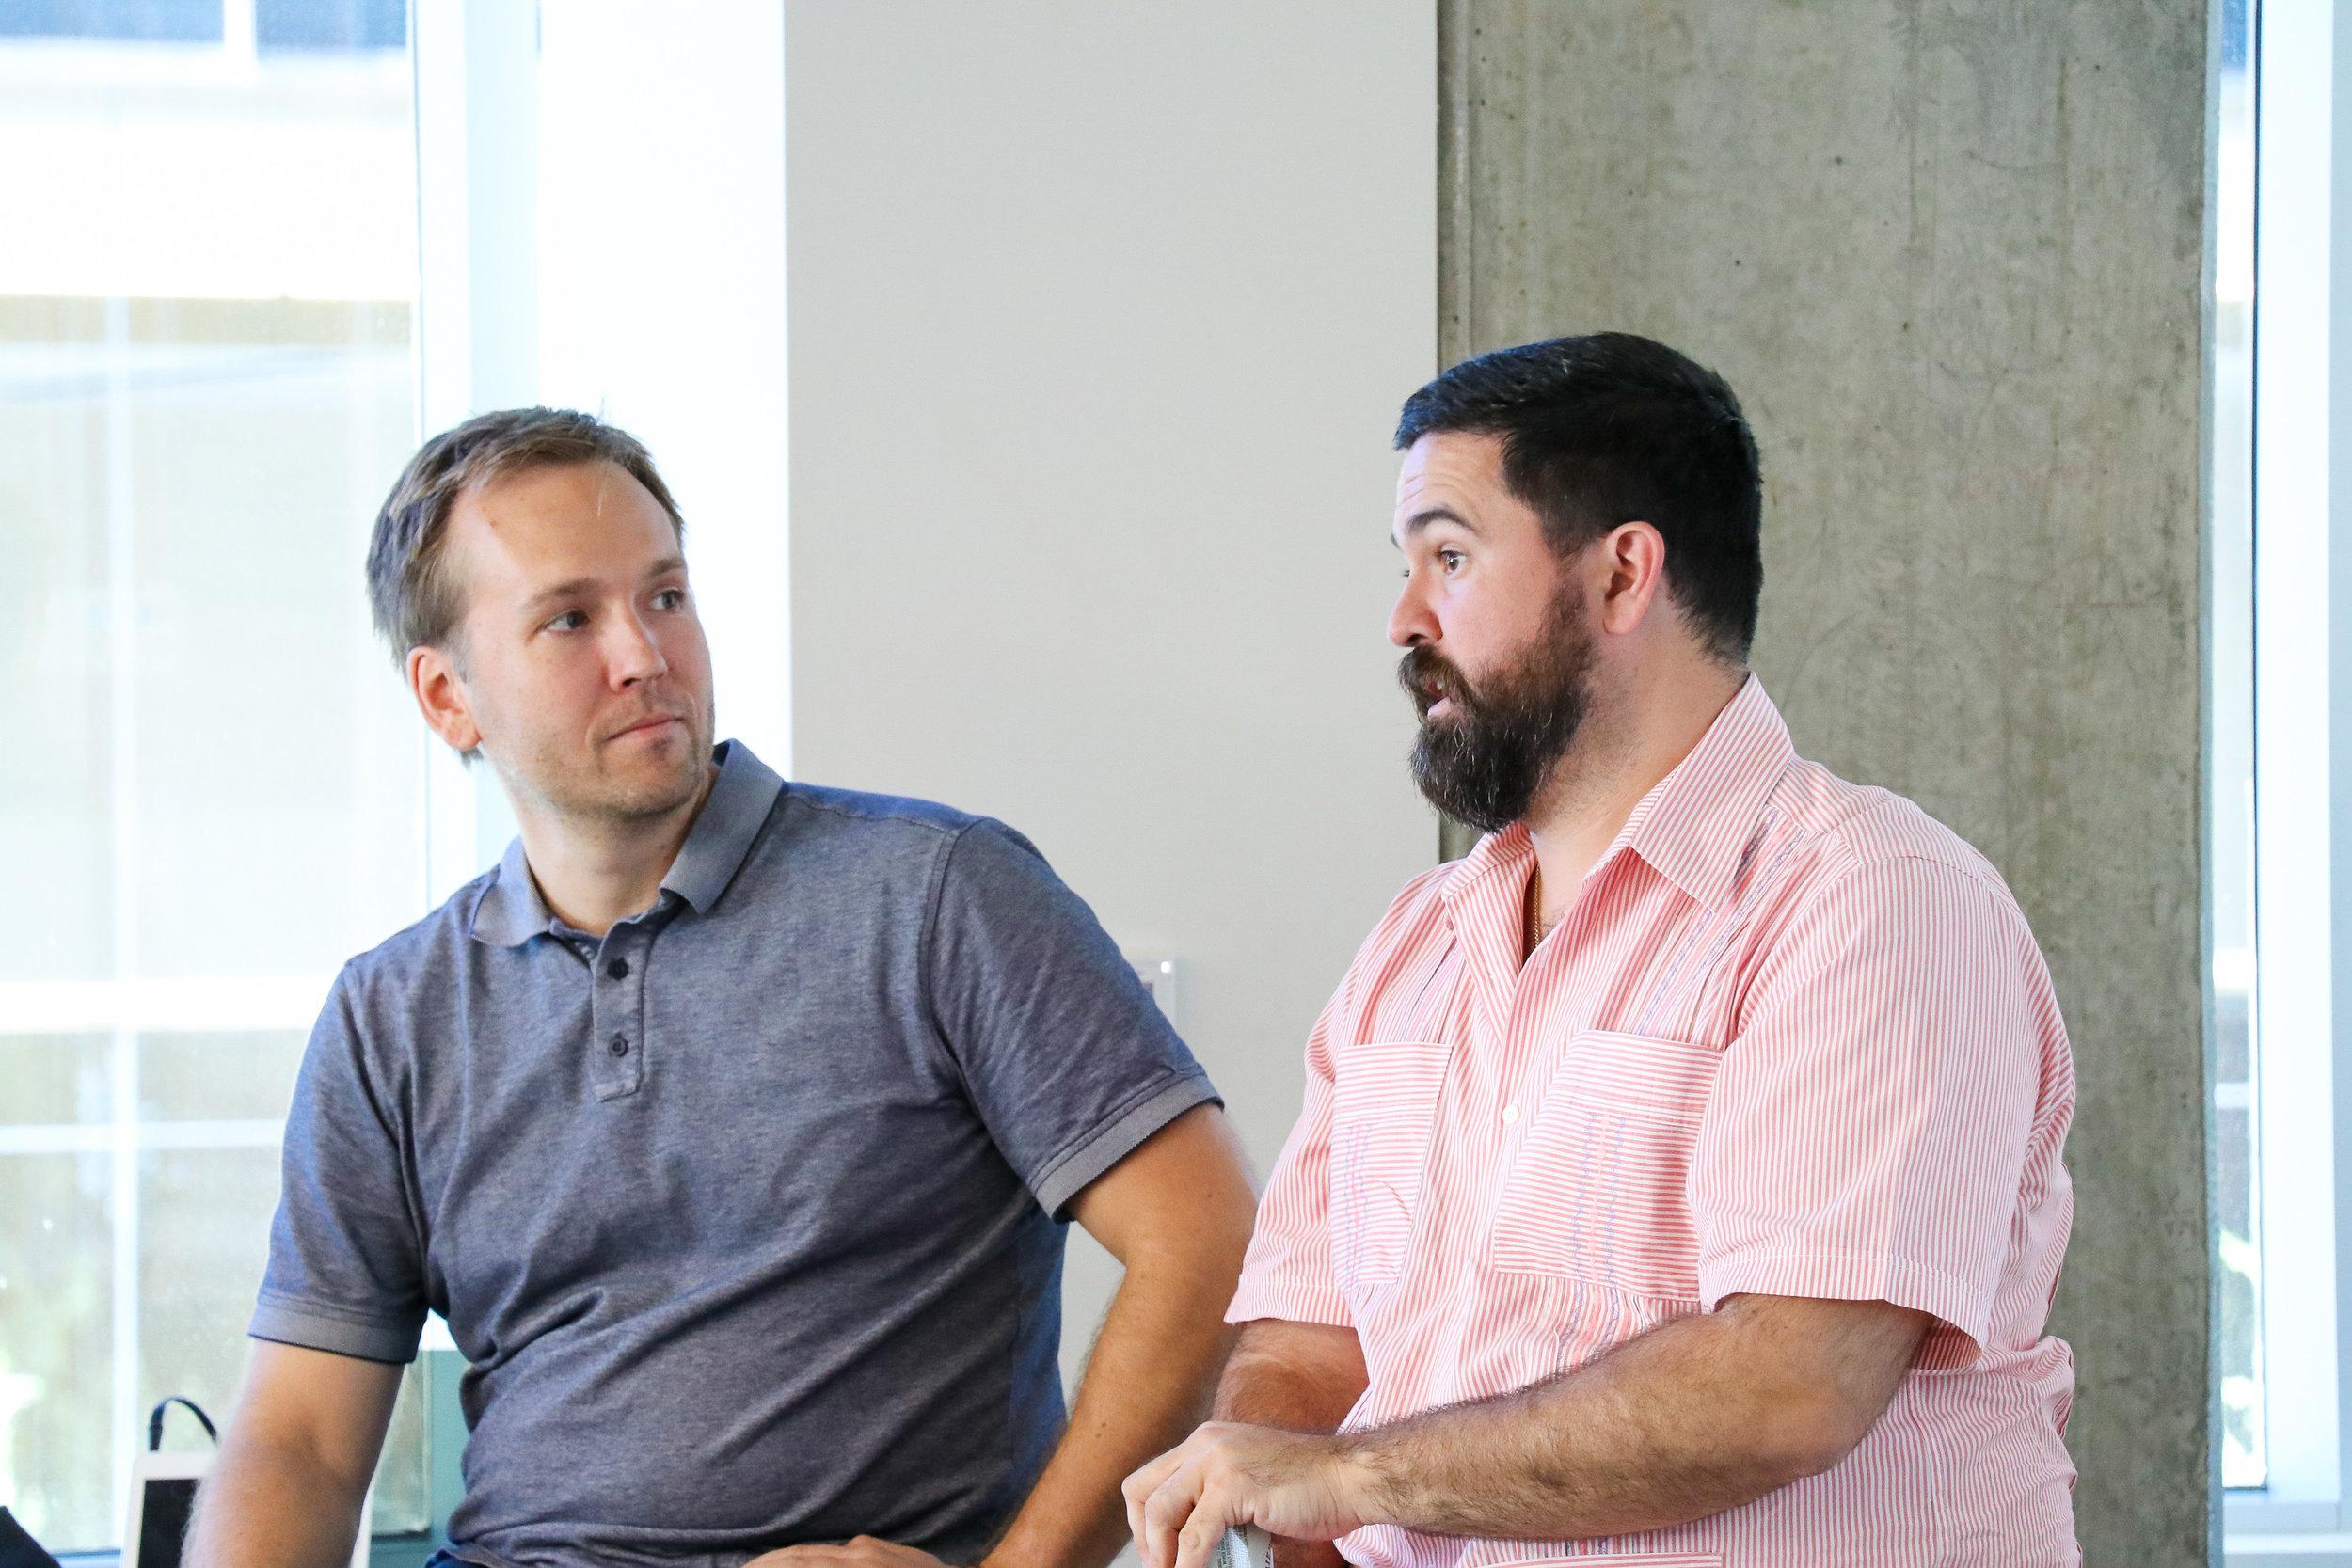 Notley Cofounder Dan Graham and Google's Gerardo Interiano